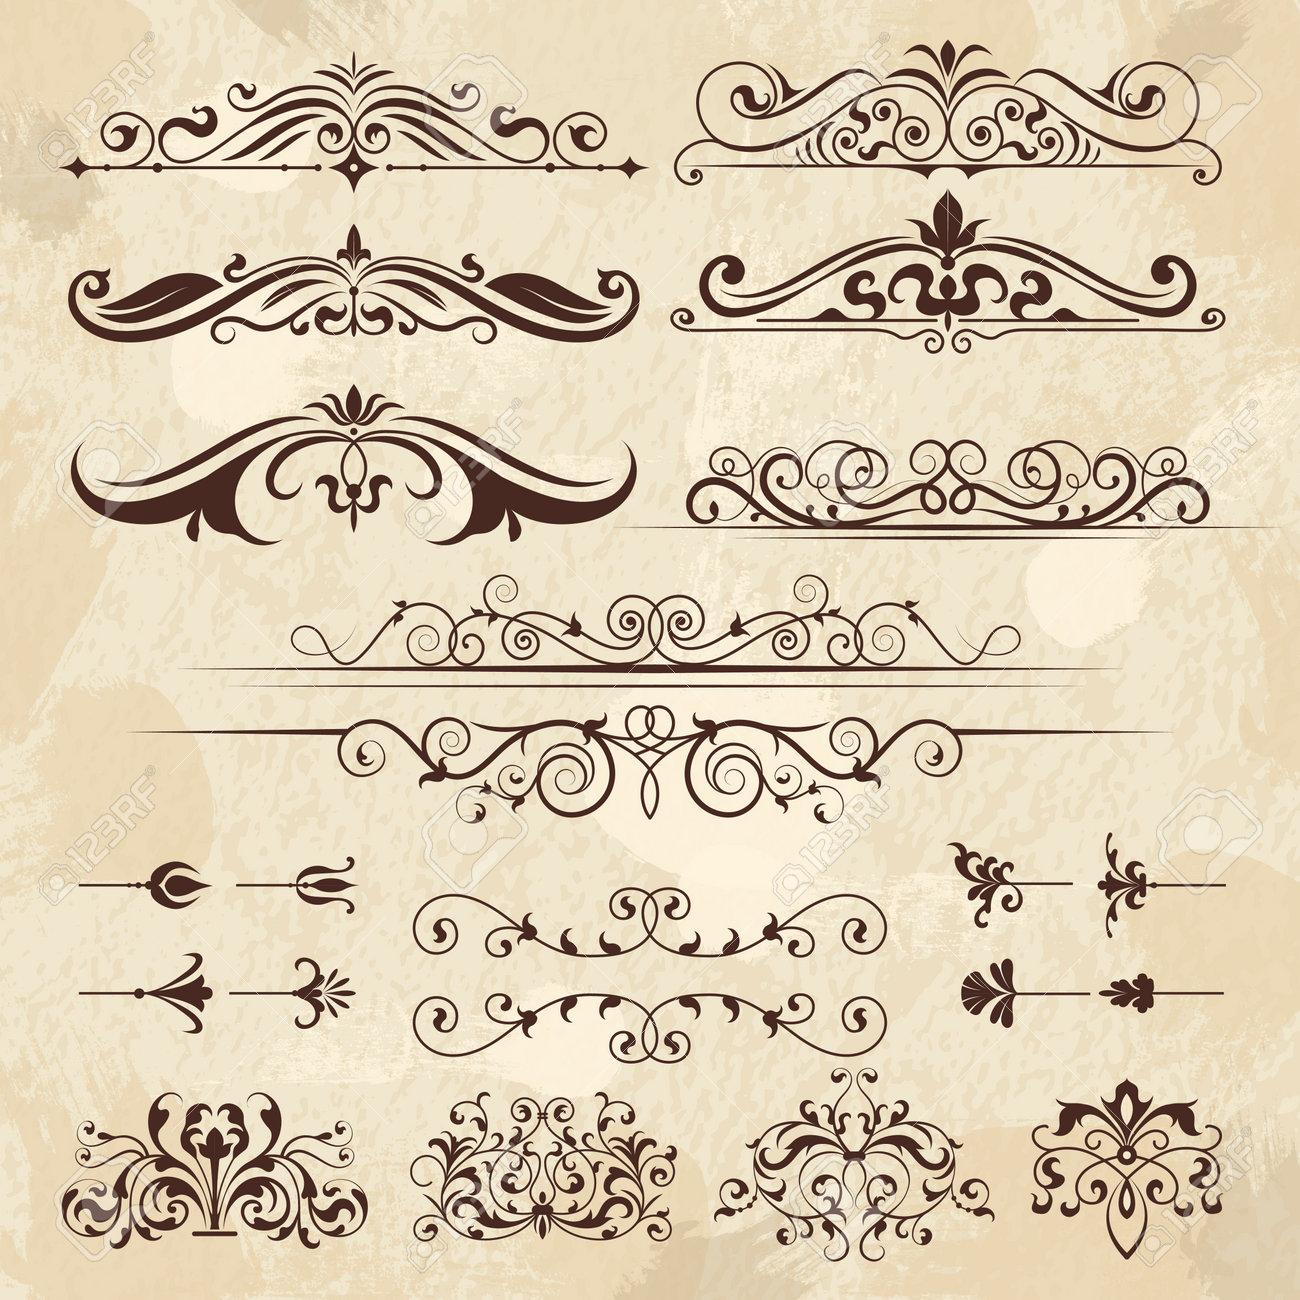 Vintage frame elements. Calligraphy borders and corners filigree classic retro vector design template. Illustration of menu decoration, ornament and filigree decorative frame border - 168222783